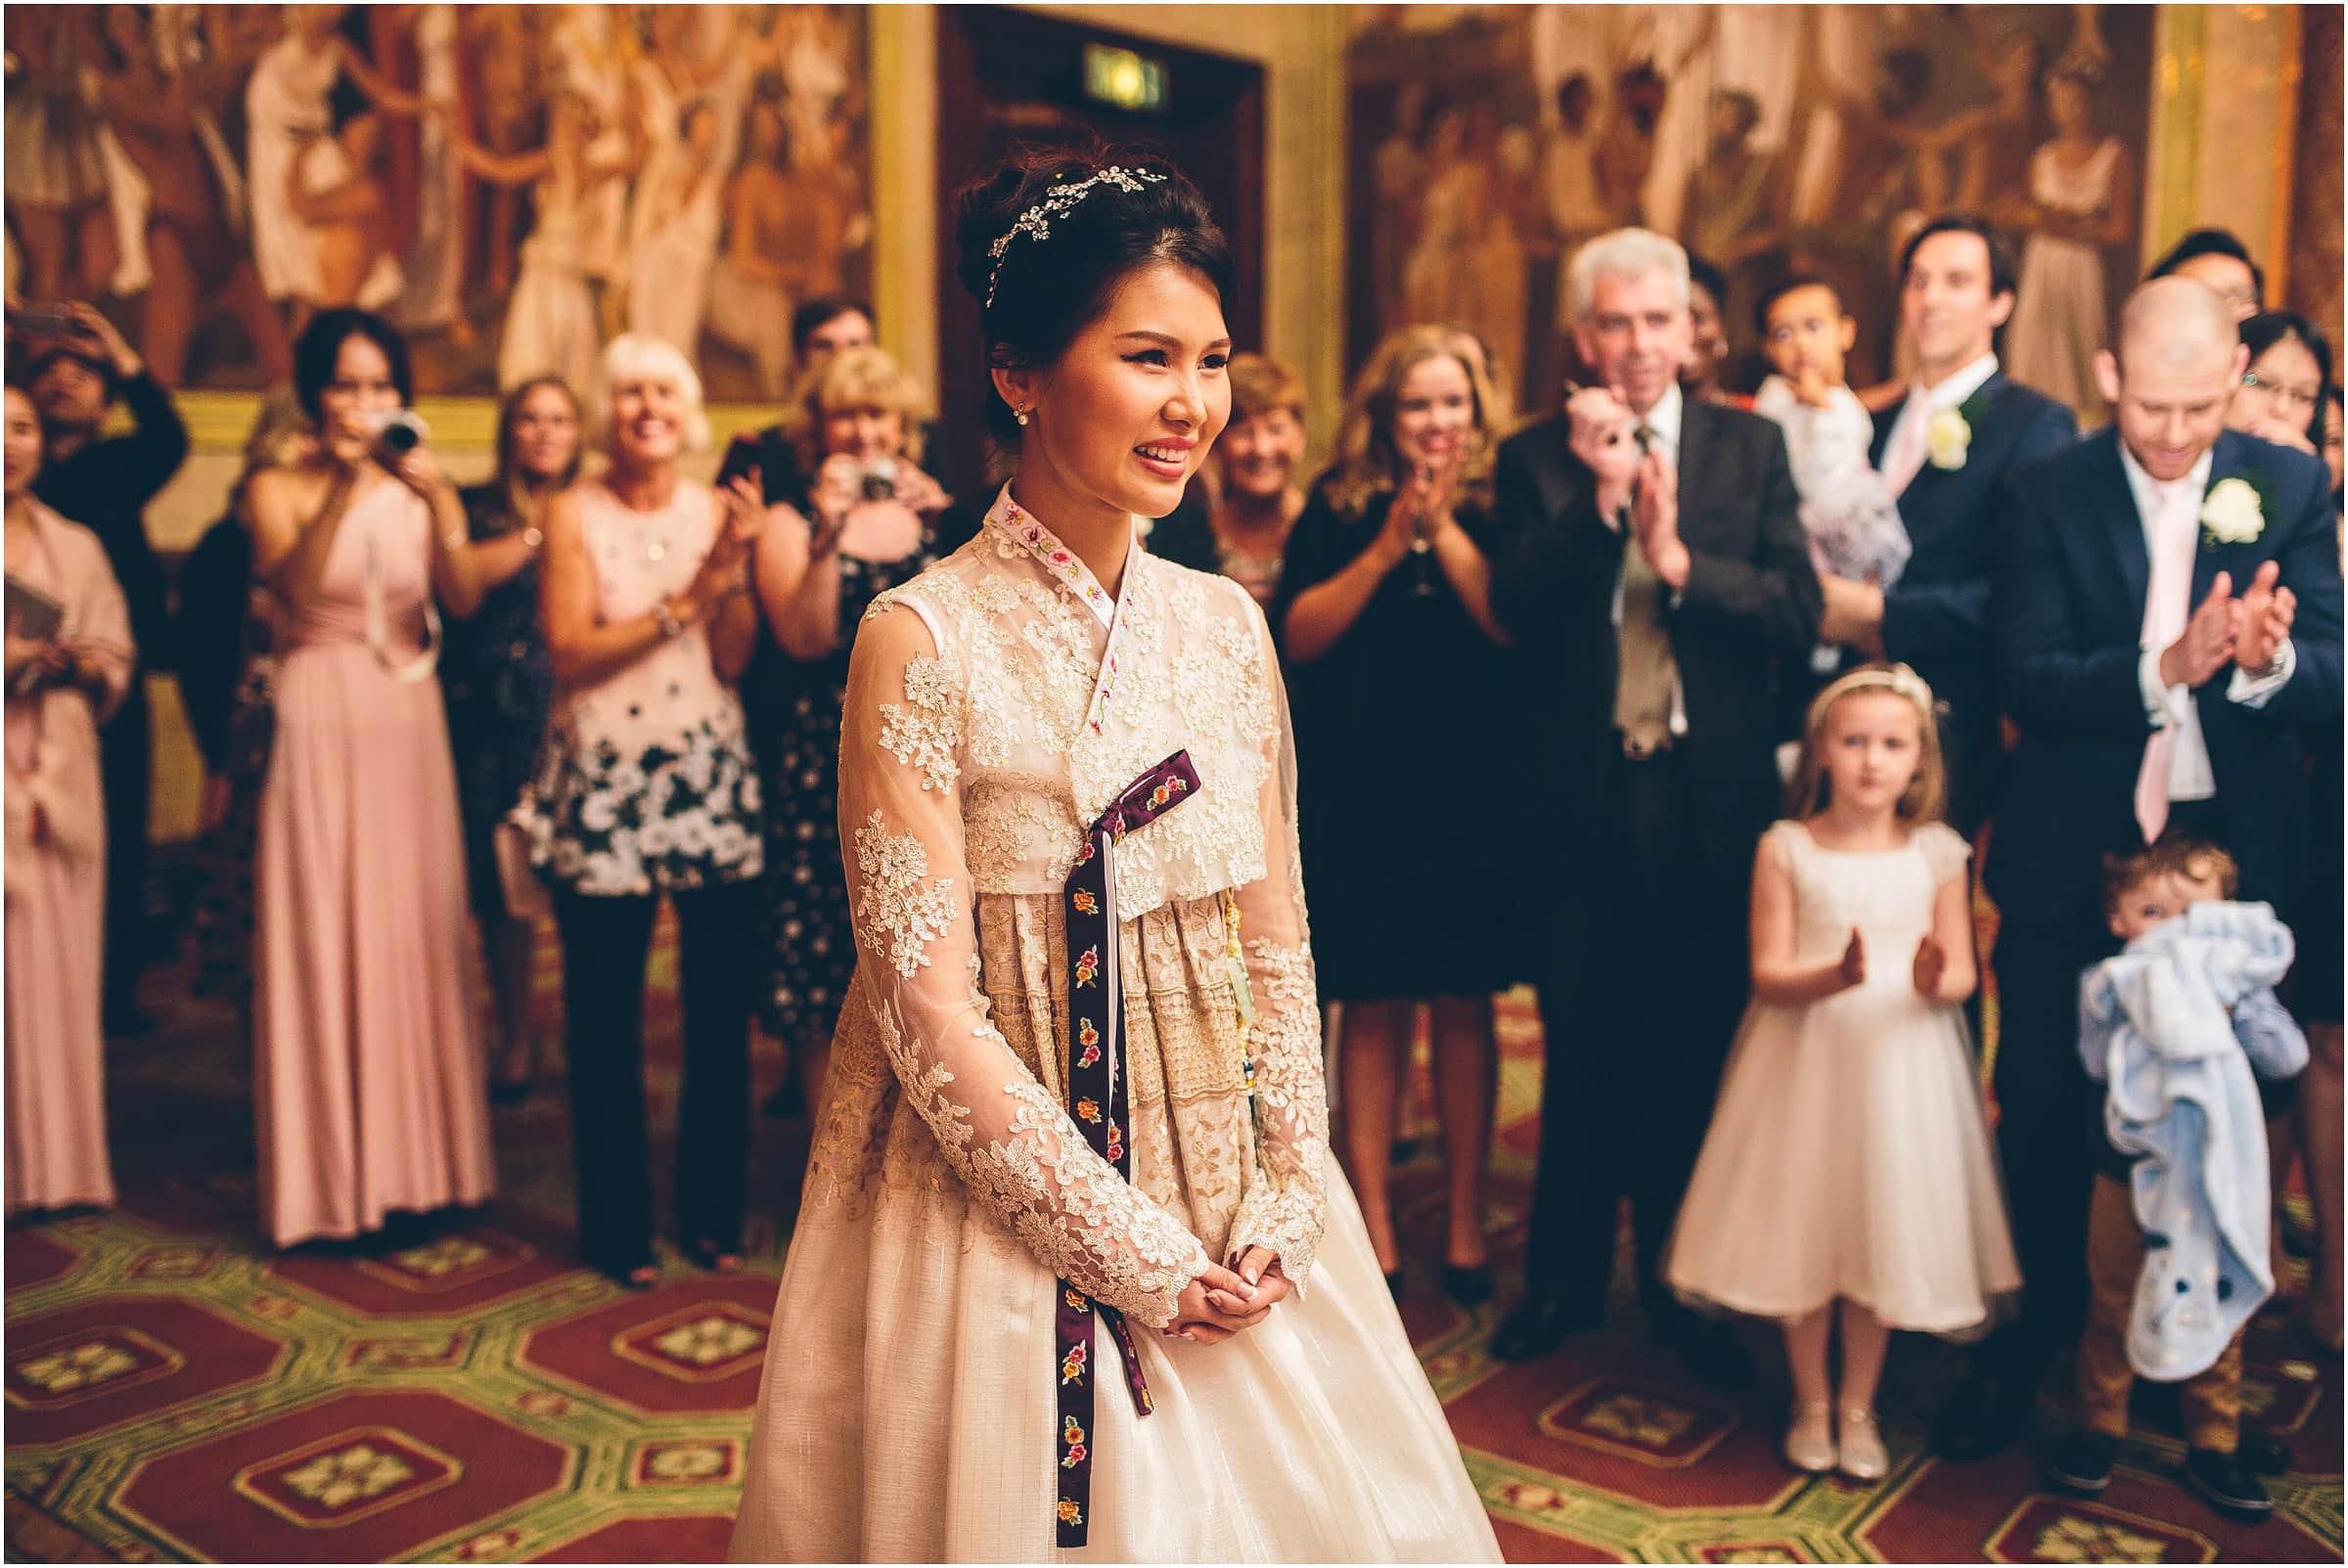 Royal_Horseguards_Wedding_Photography_0059